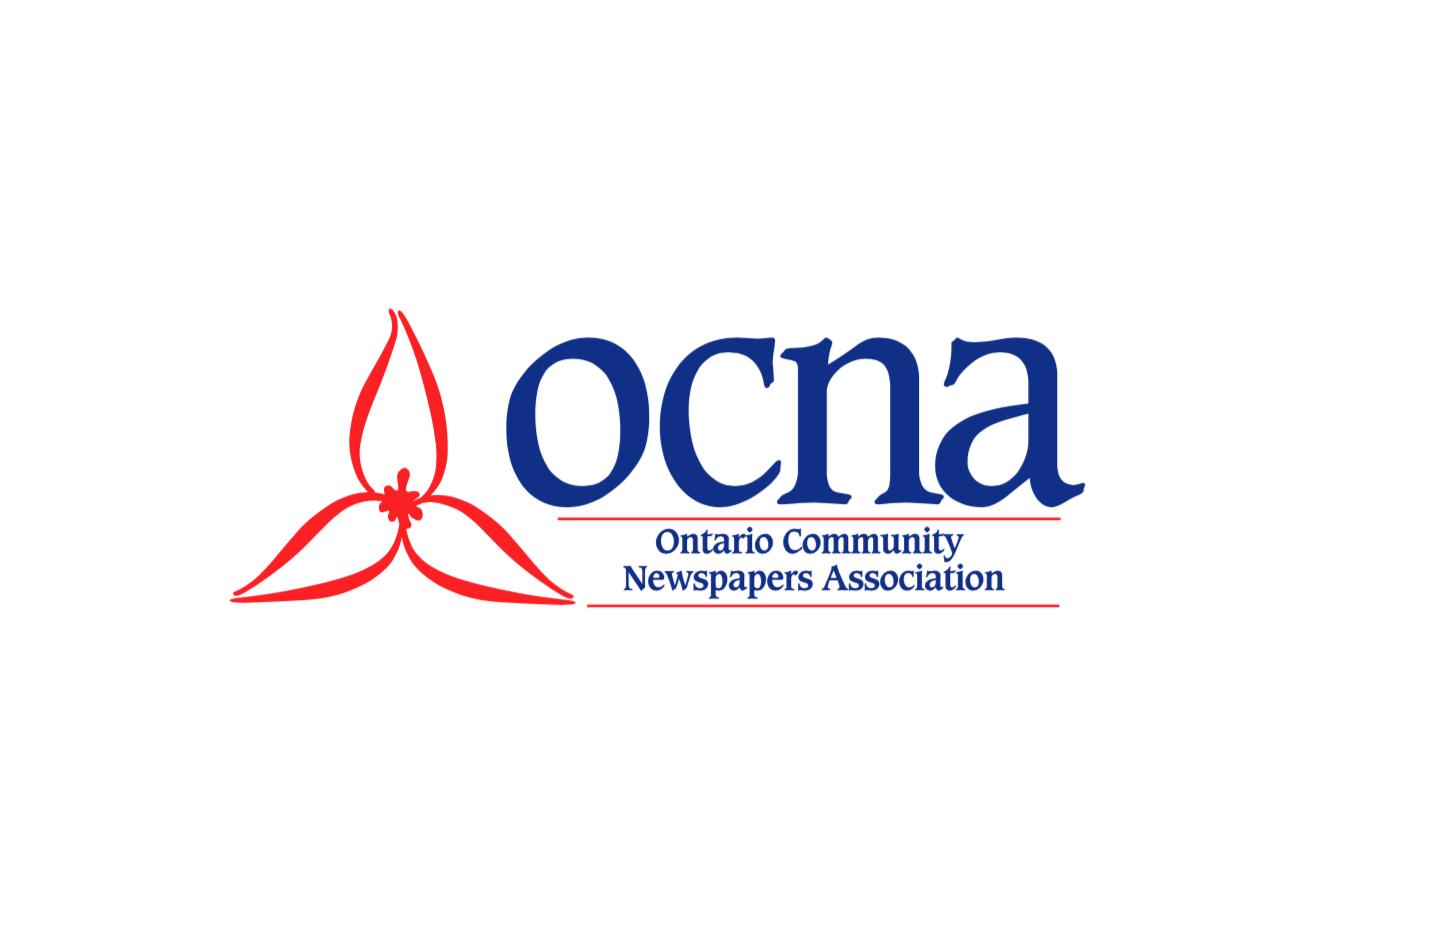 OCNA Hall of Fame class of 2020